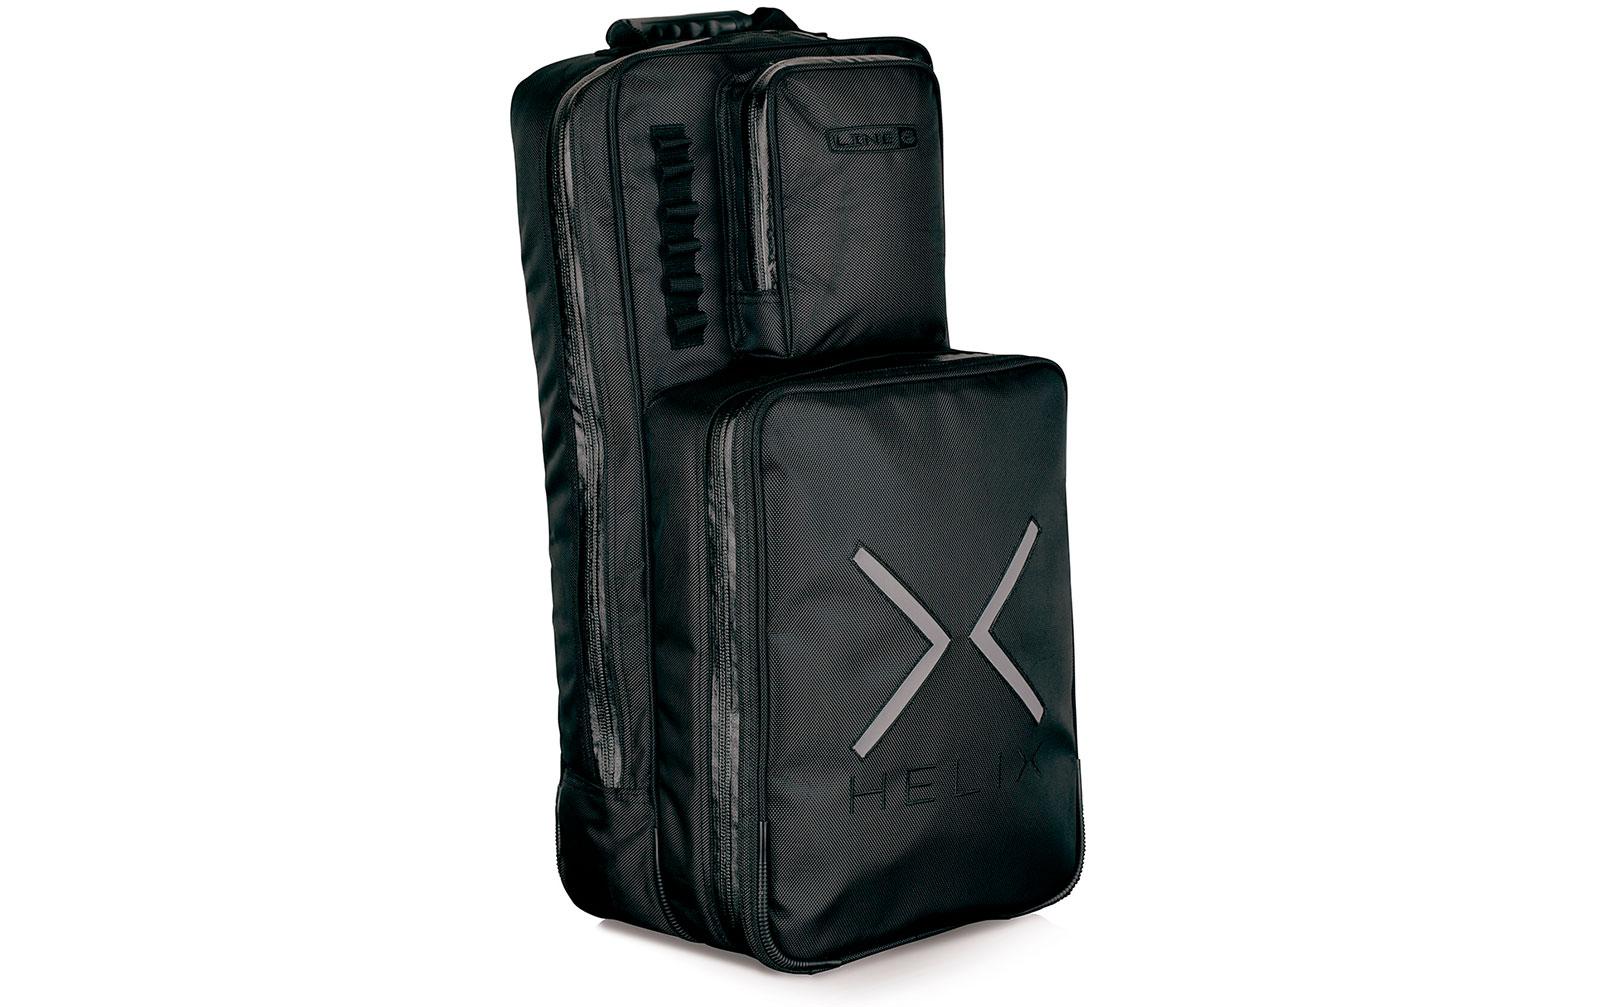 line6-helix-backpack